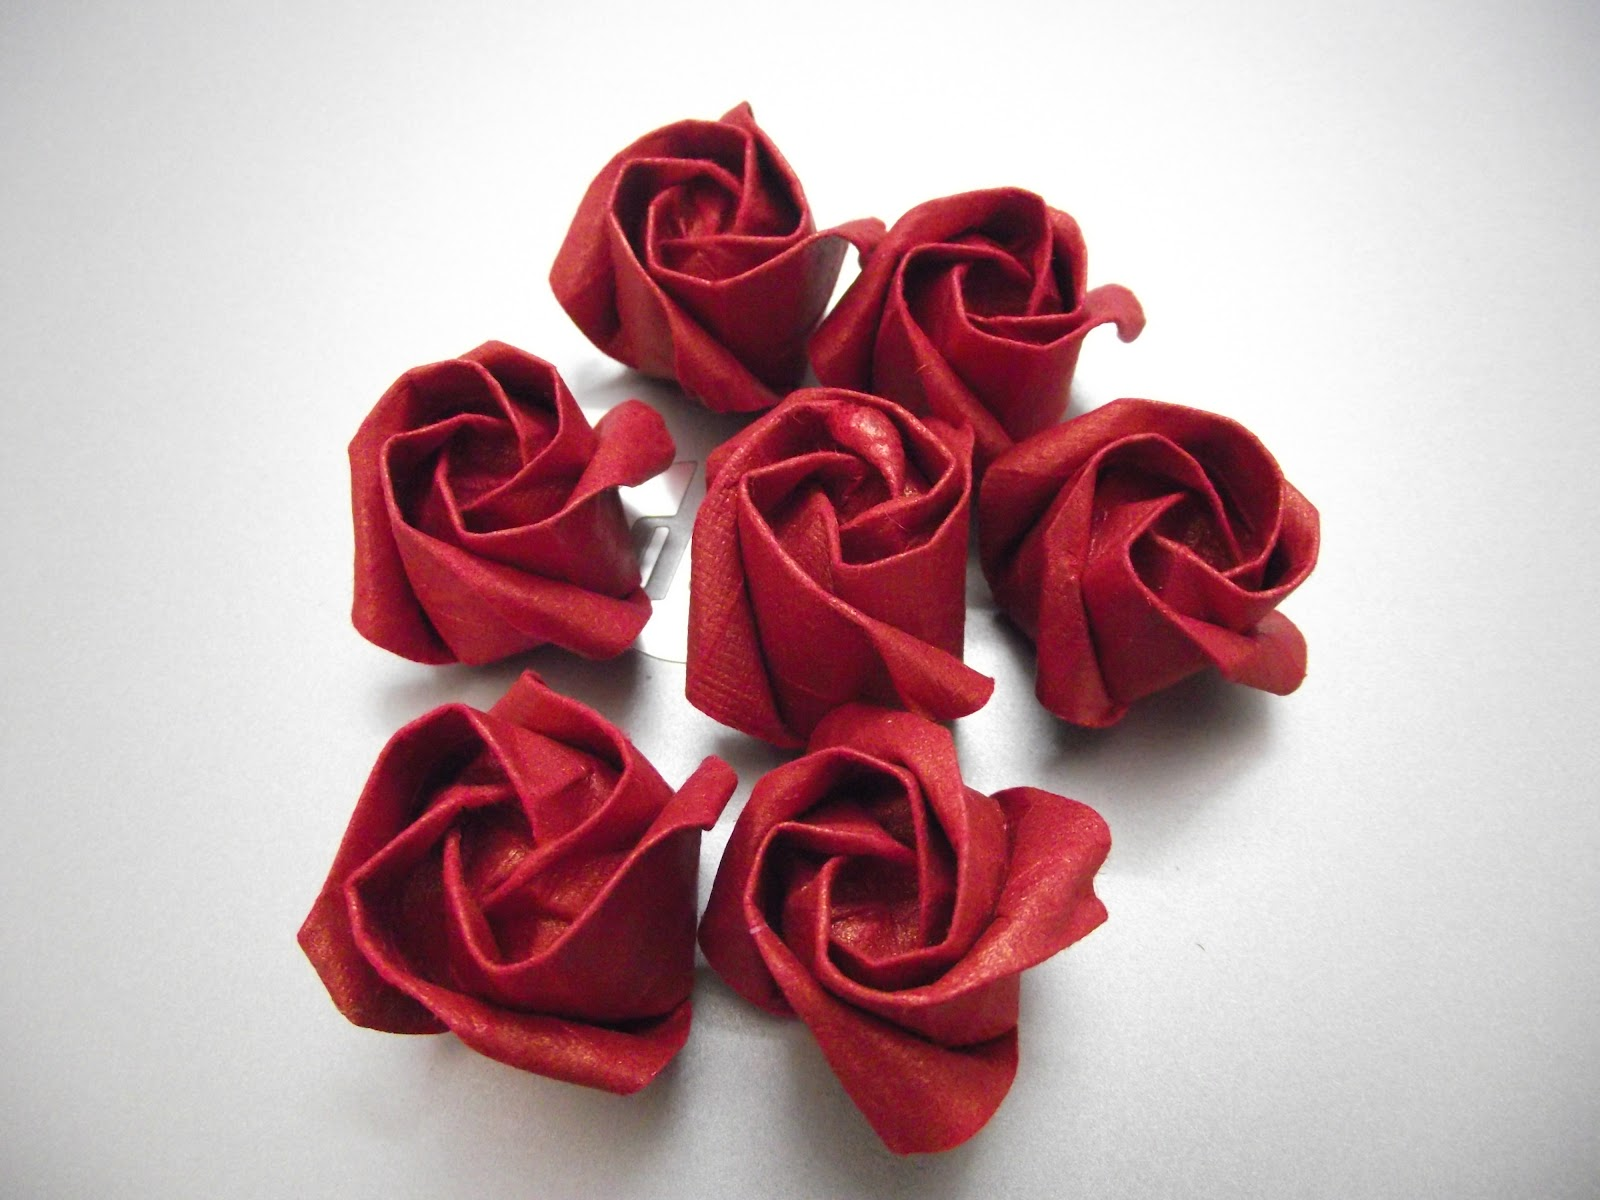 Printable Origami Paper Templates